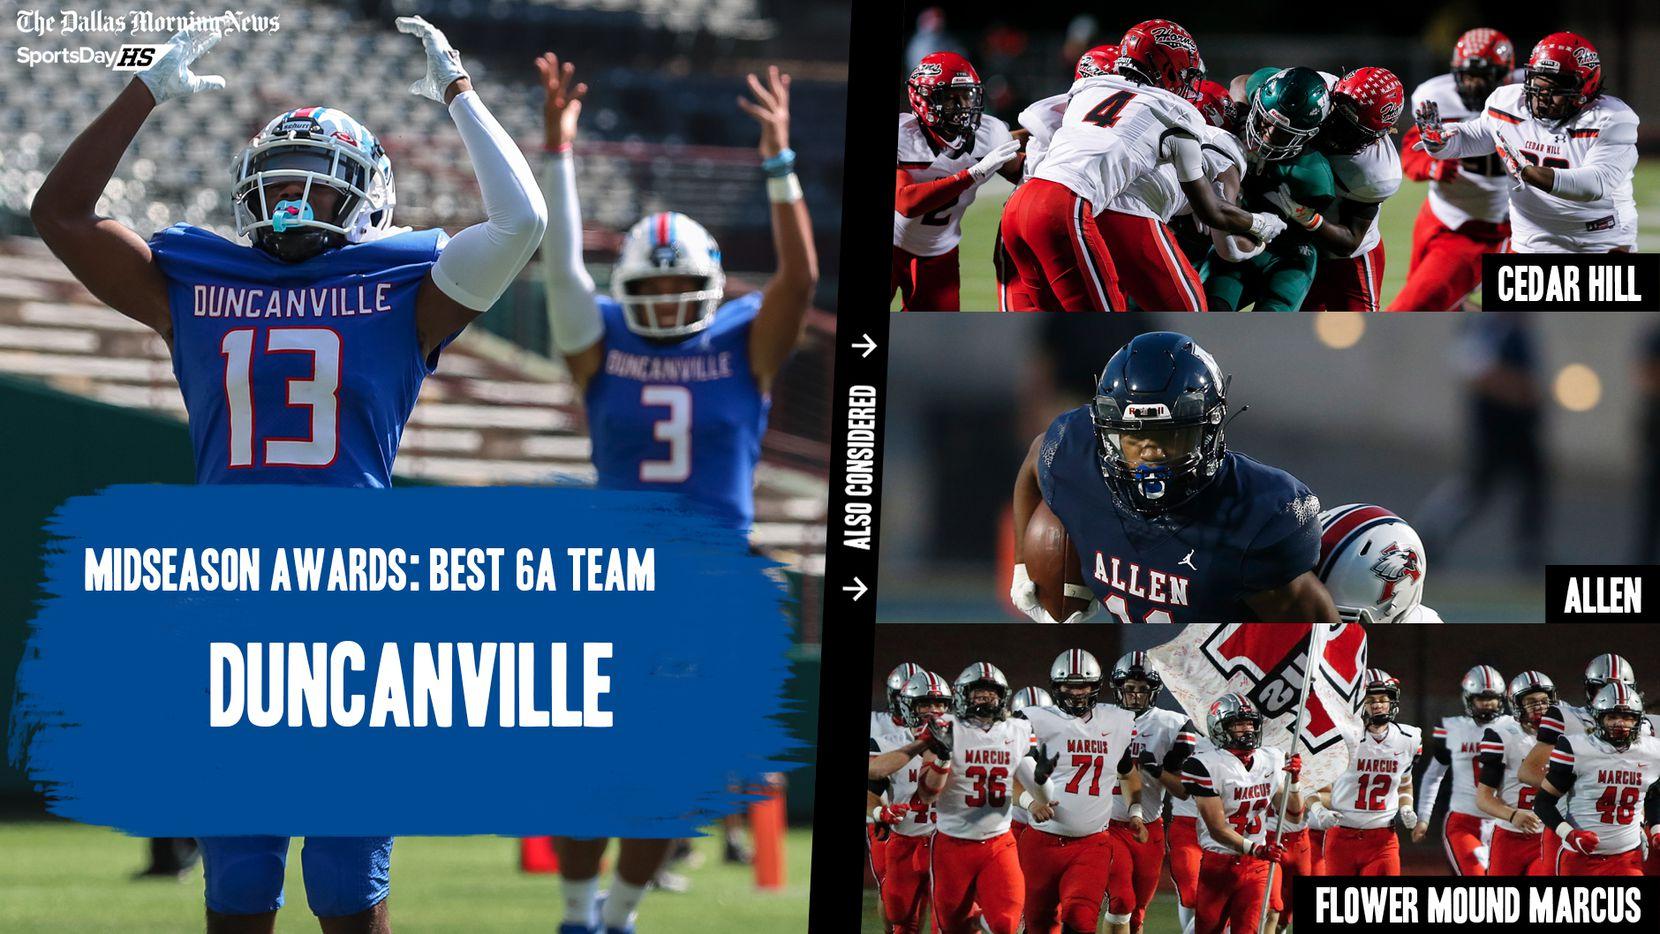 The Dallas Morning News' midseason awards for the 2020 football season: the best 6A teams.